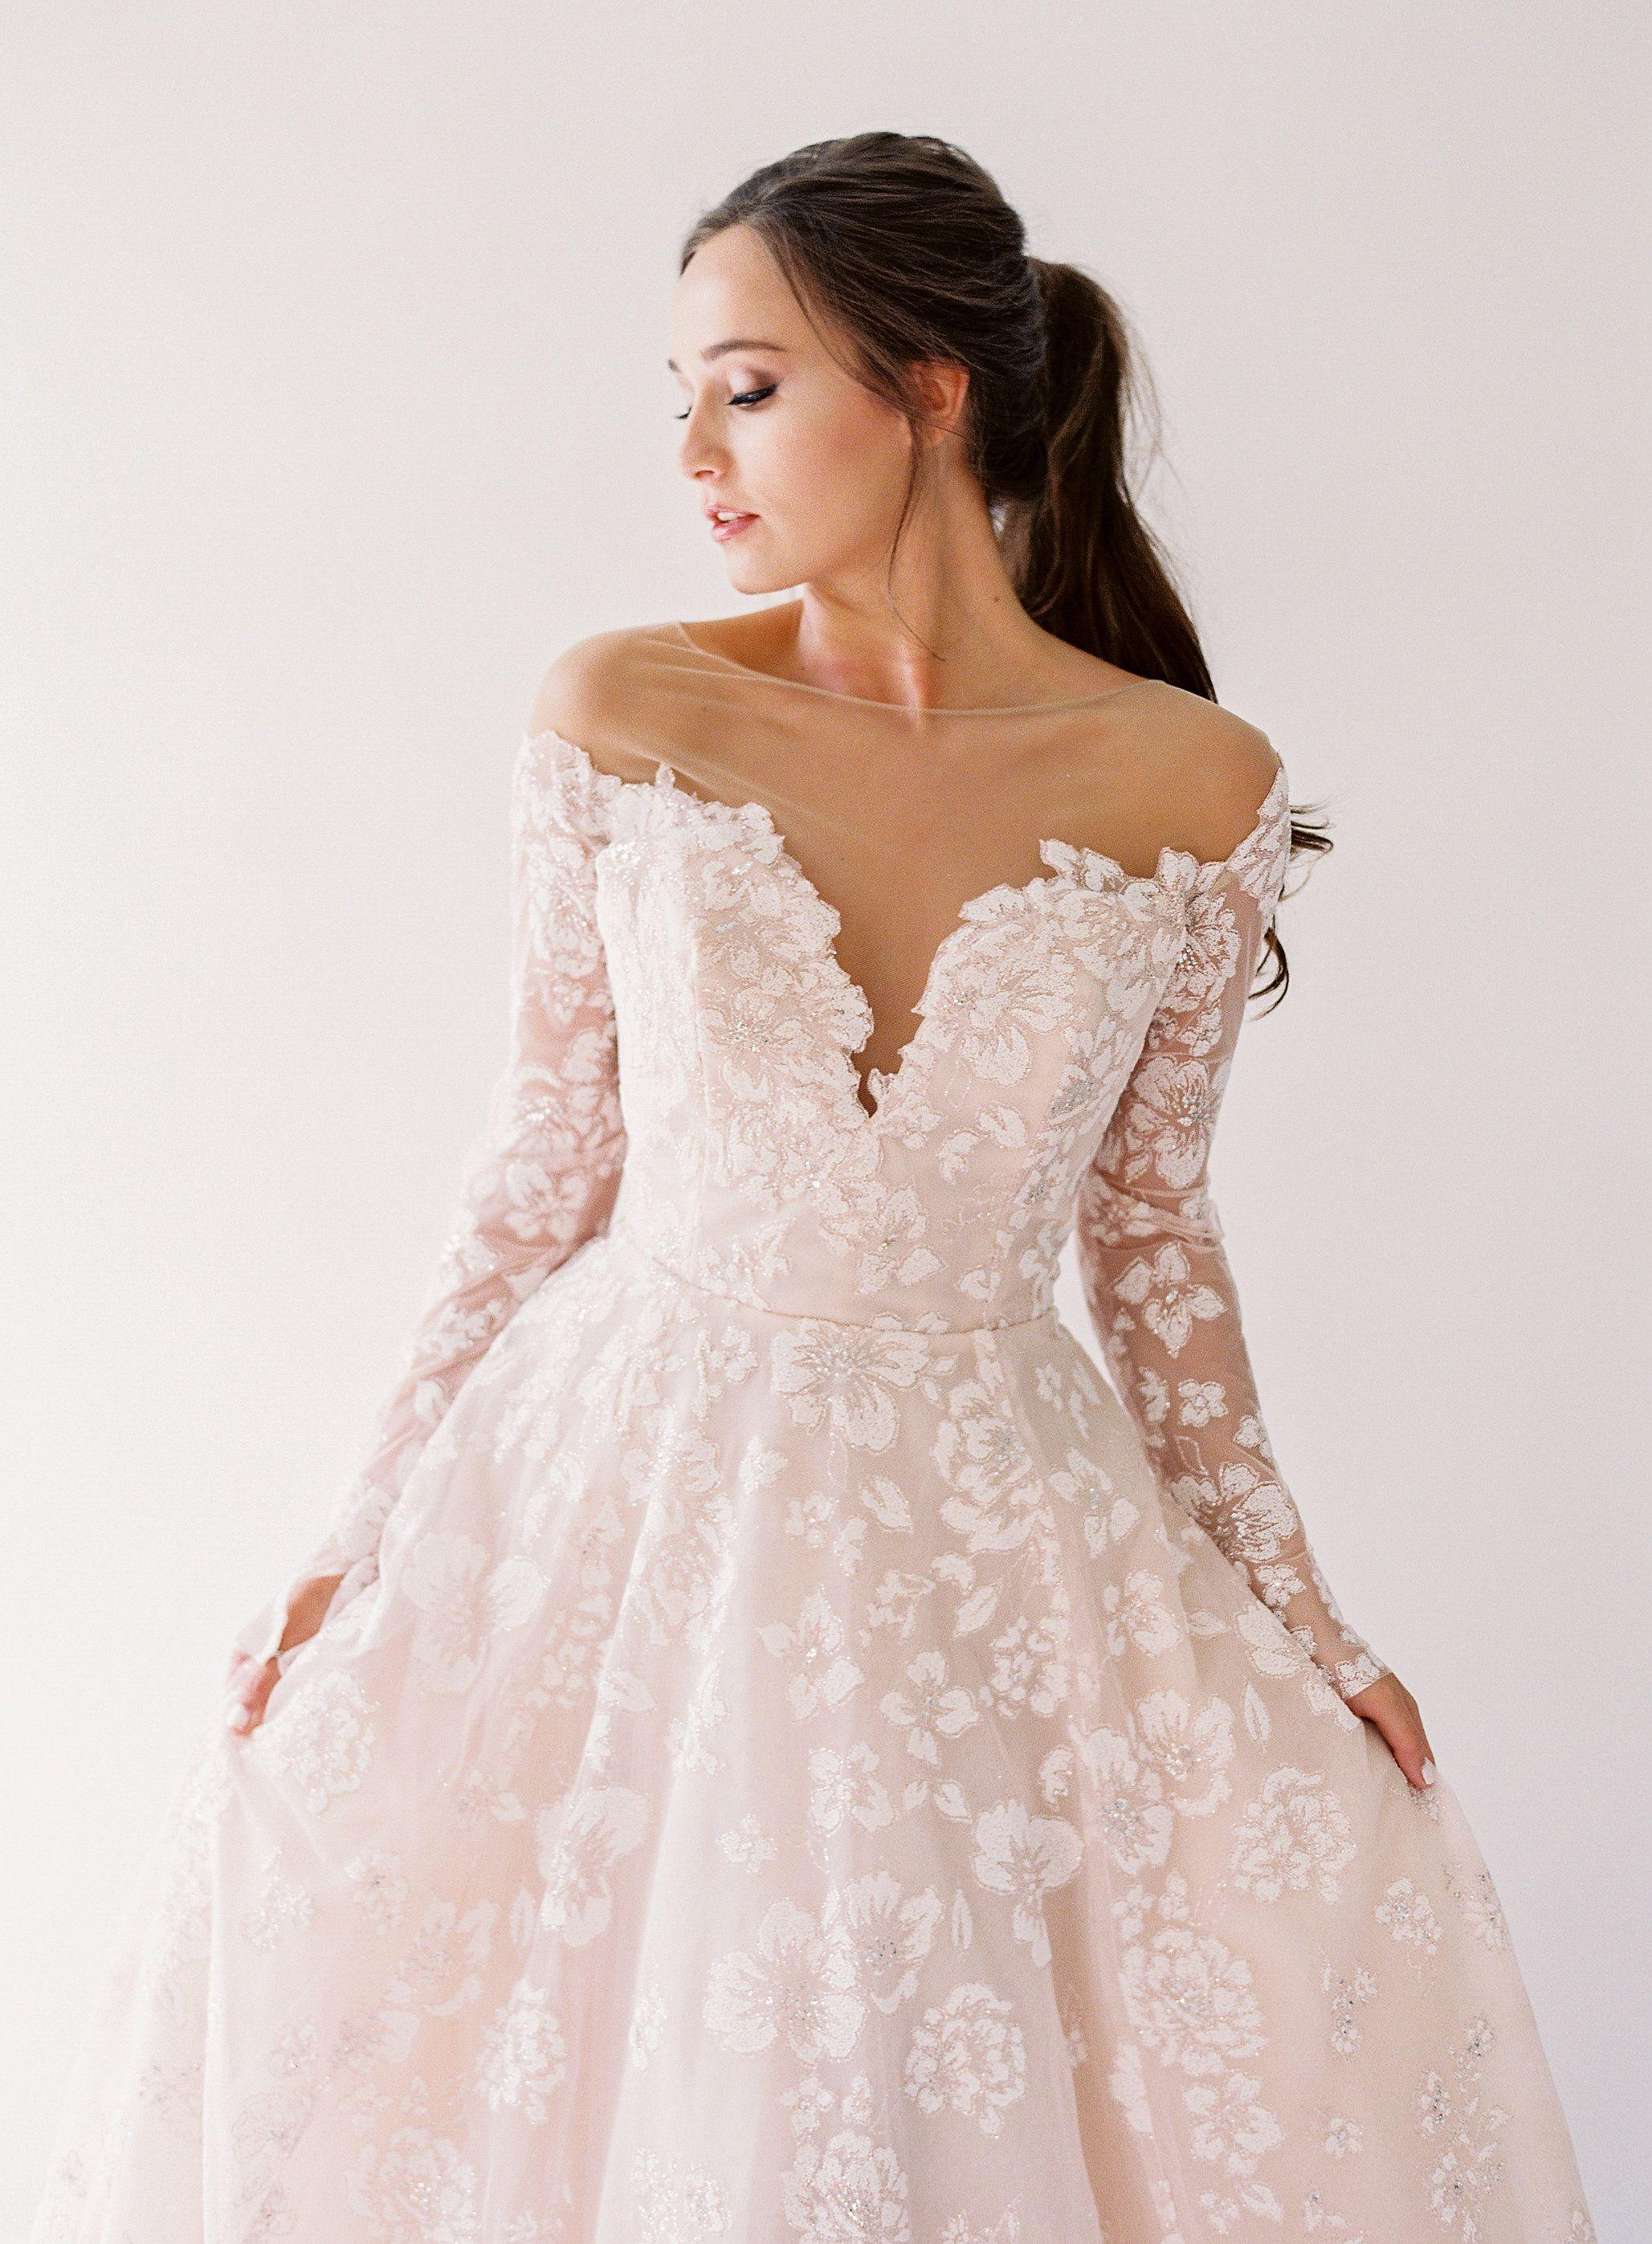 Stevie Hayley Paige Elle James Bridal Longsleeveweddingdress Hayleypaige Glamourous Wedding Dress Wedding Dress Long Sleeve Wedding Dress Inspiration [ 2794 x 2057 Pixel ]